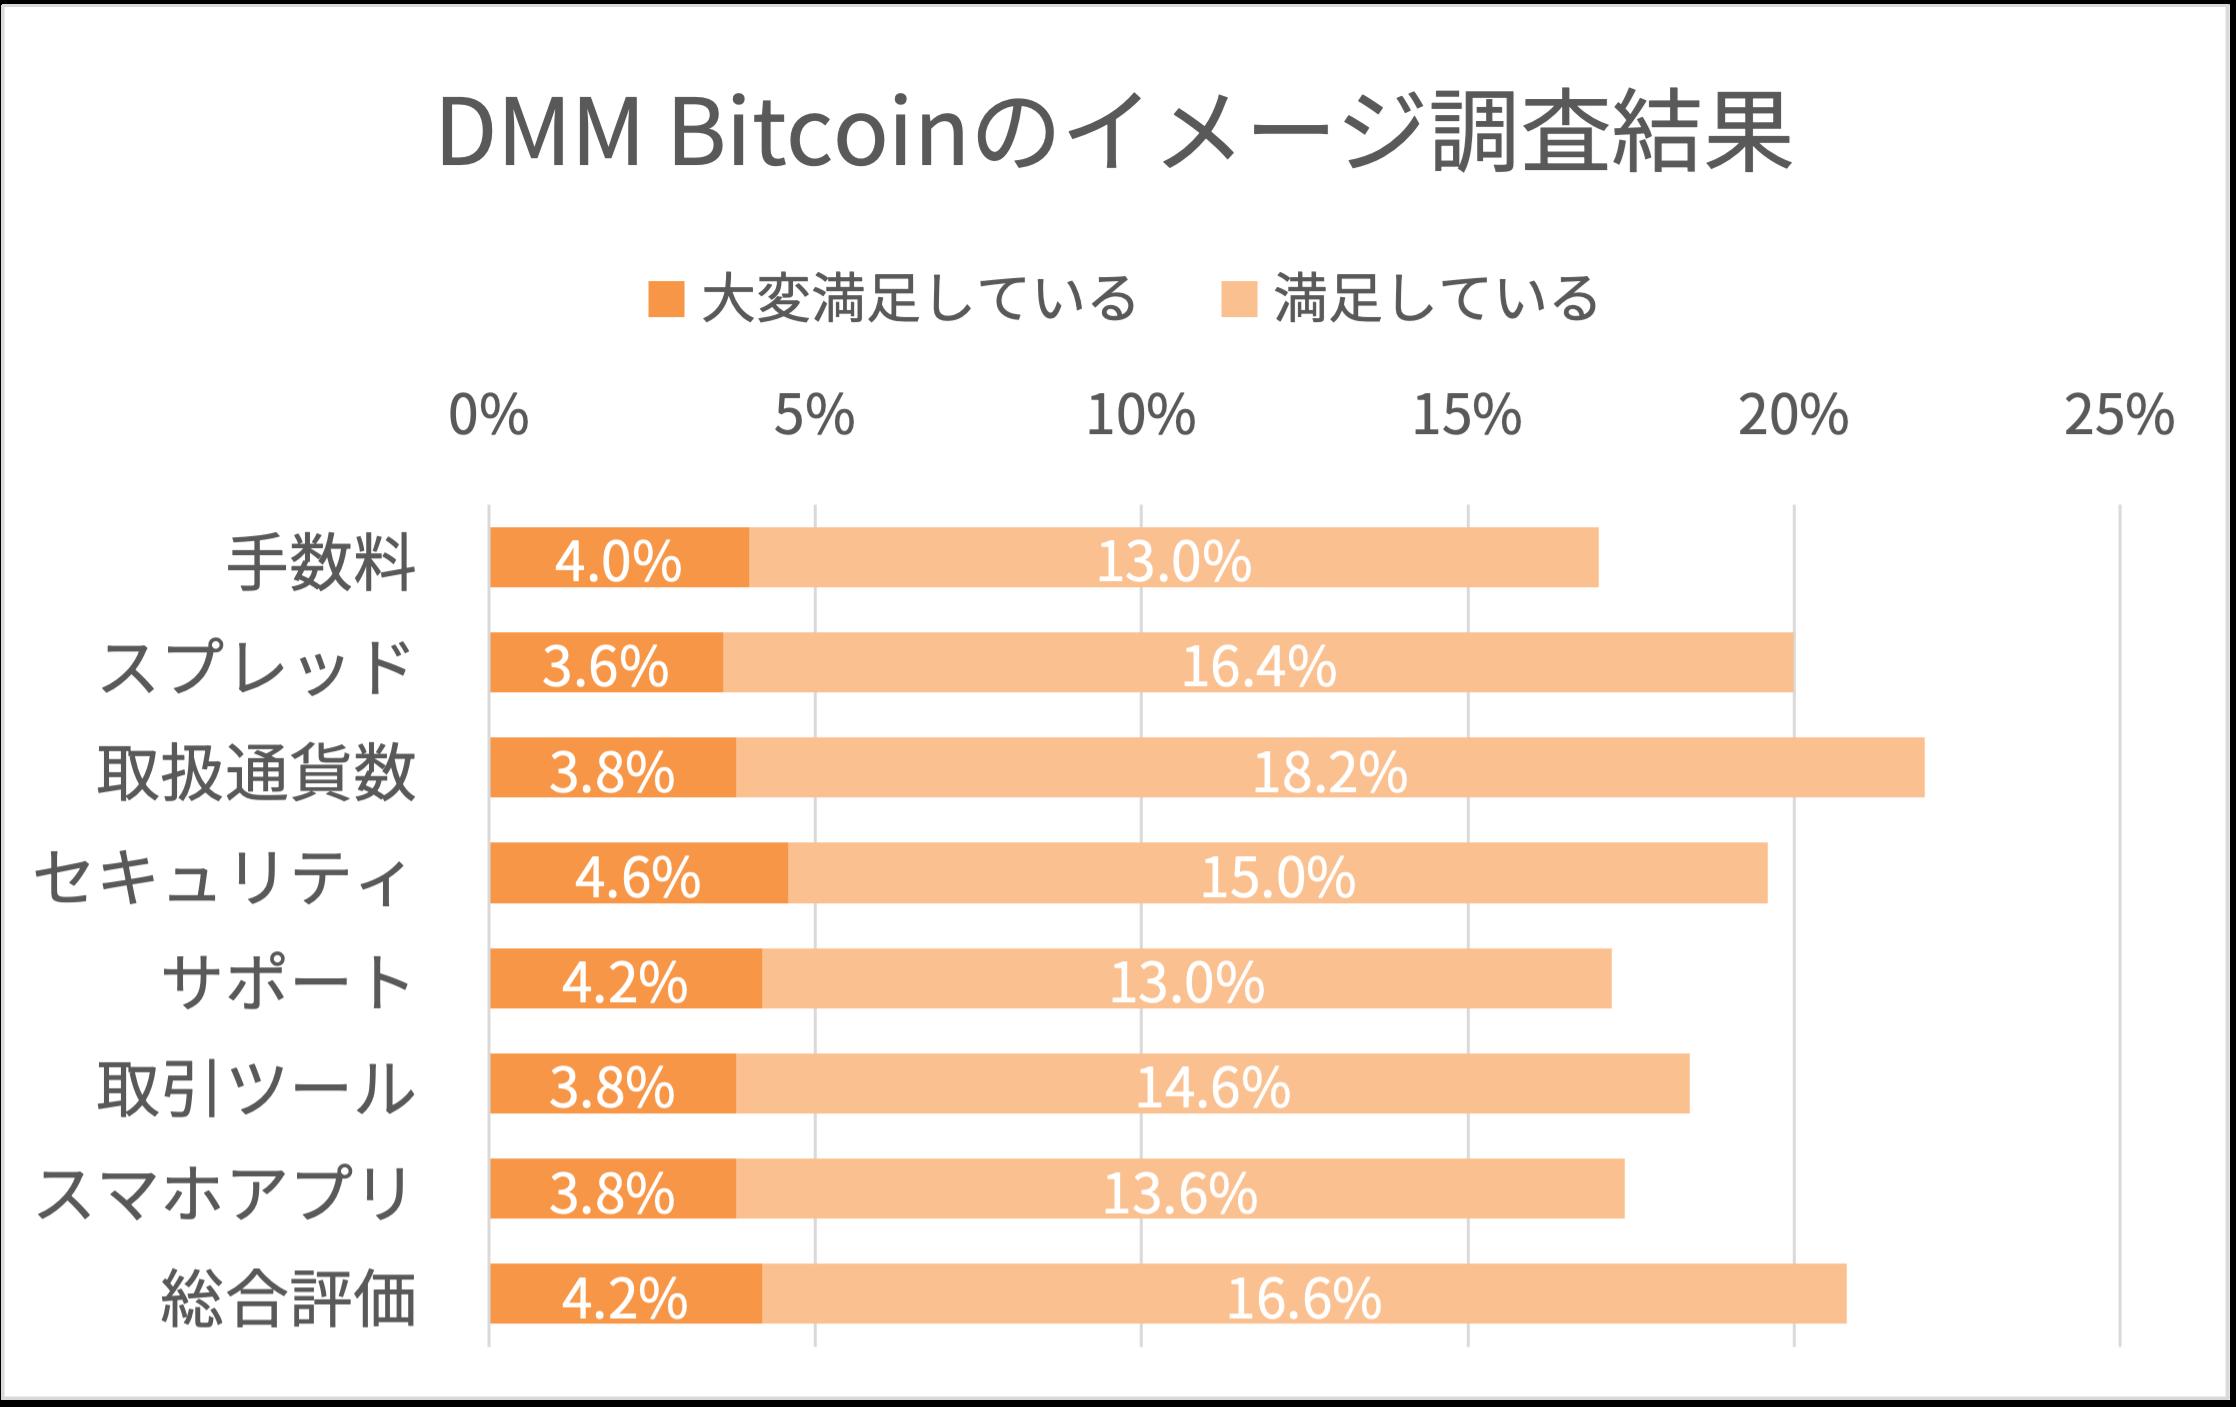 dmmbitcoinのイメージ調査結果